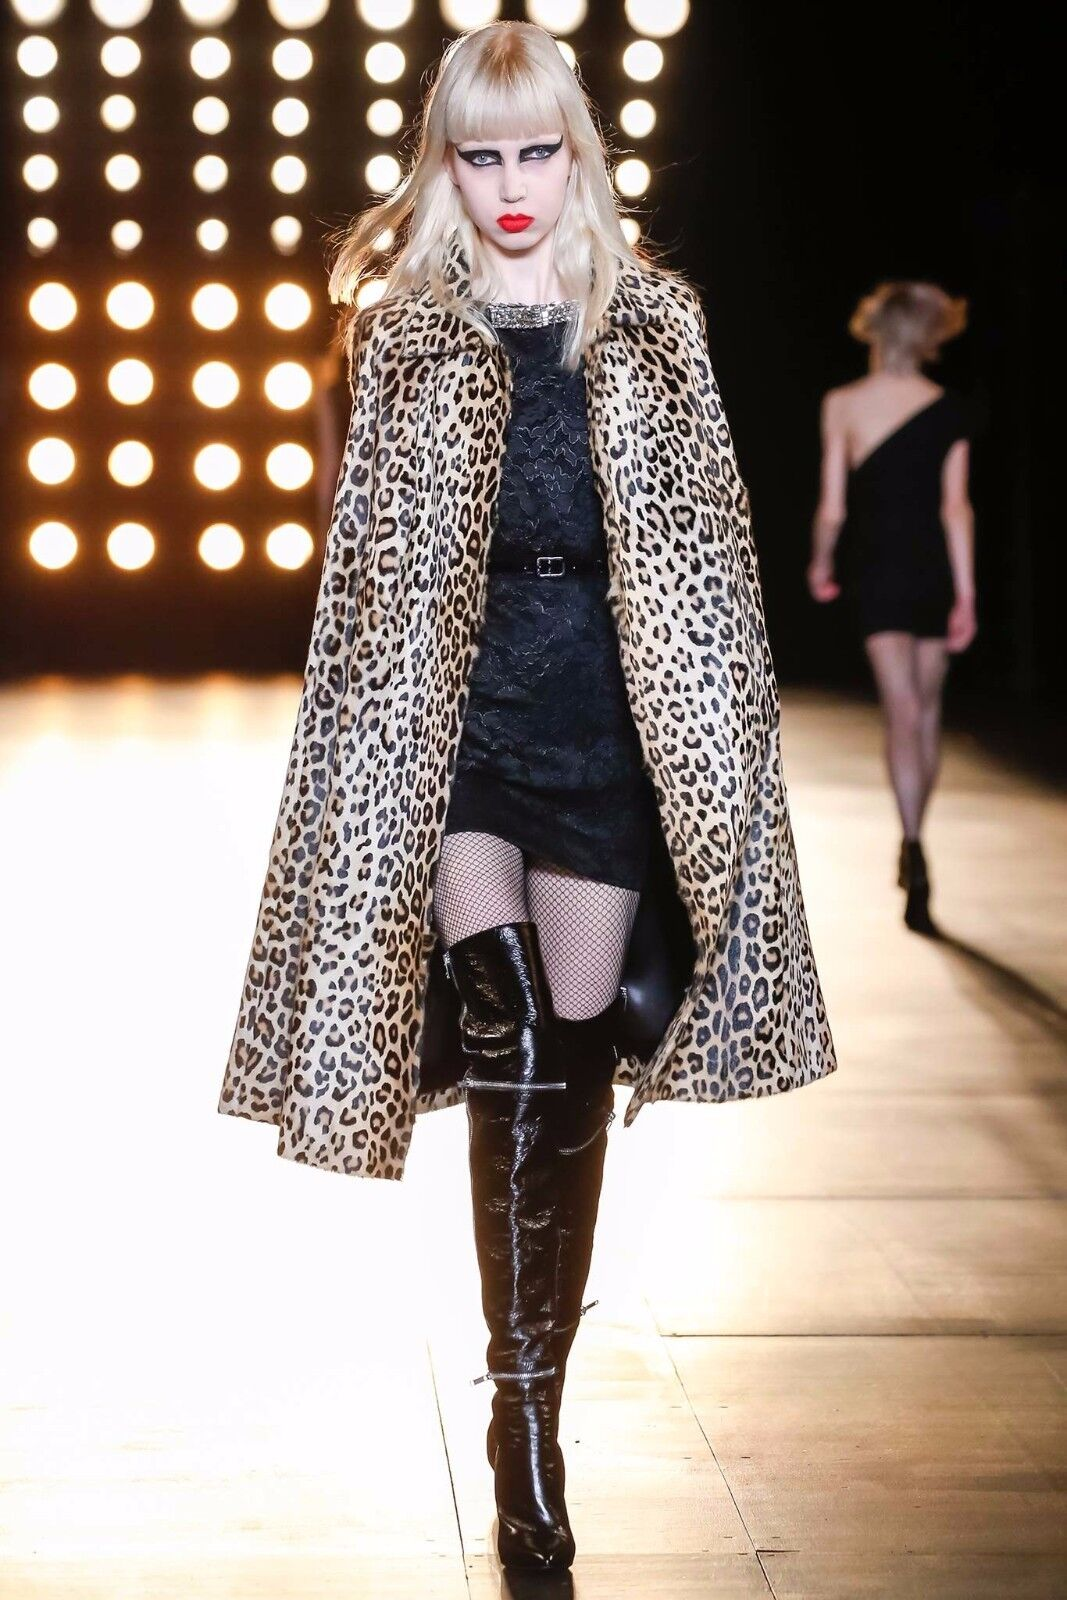 Saint Laurent Over Knee Heels Black Embellished Leather Thigh Boots BNWOB 3 36